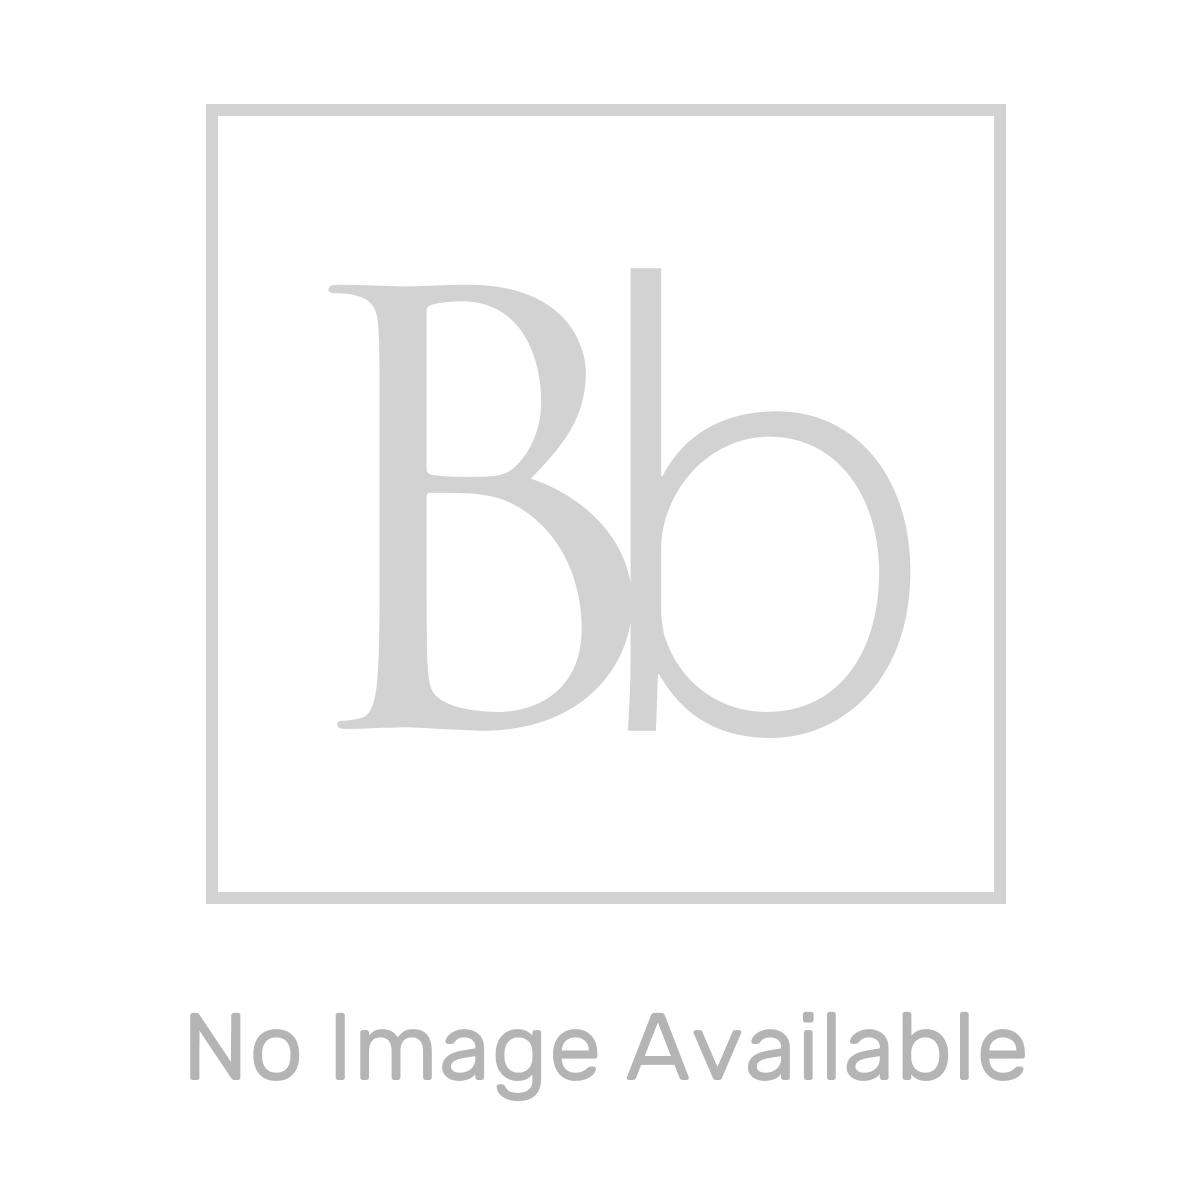 Aquadart White Slate Shower Tray 1200 x 760